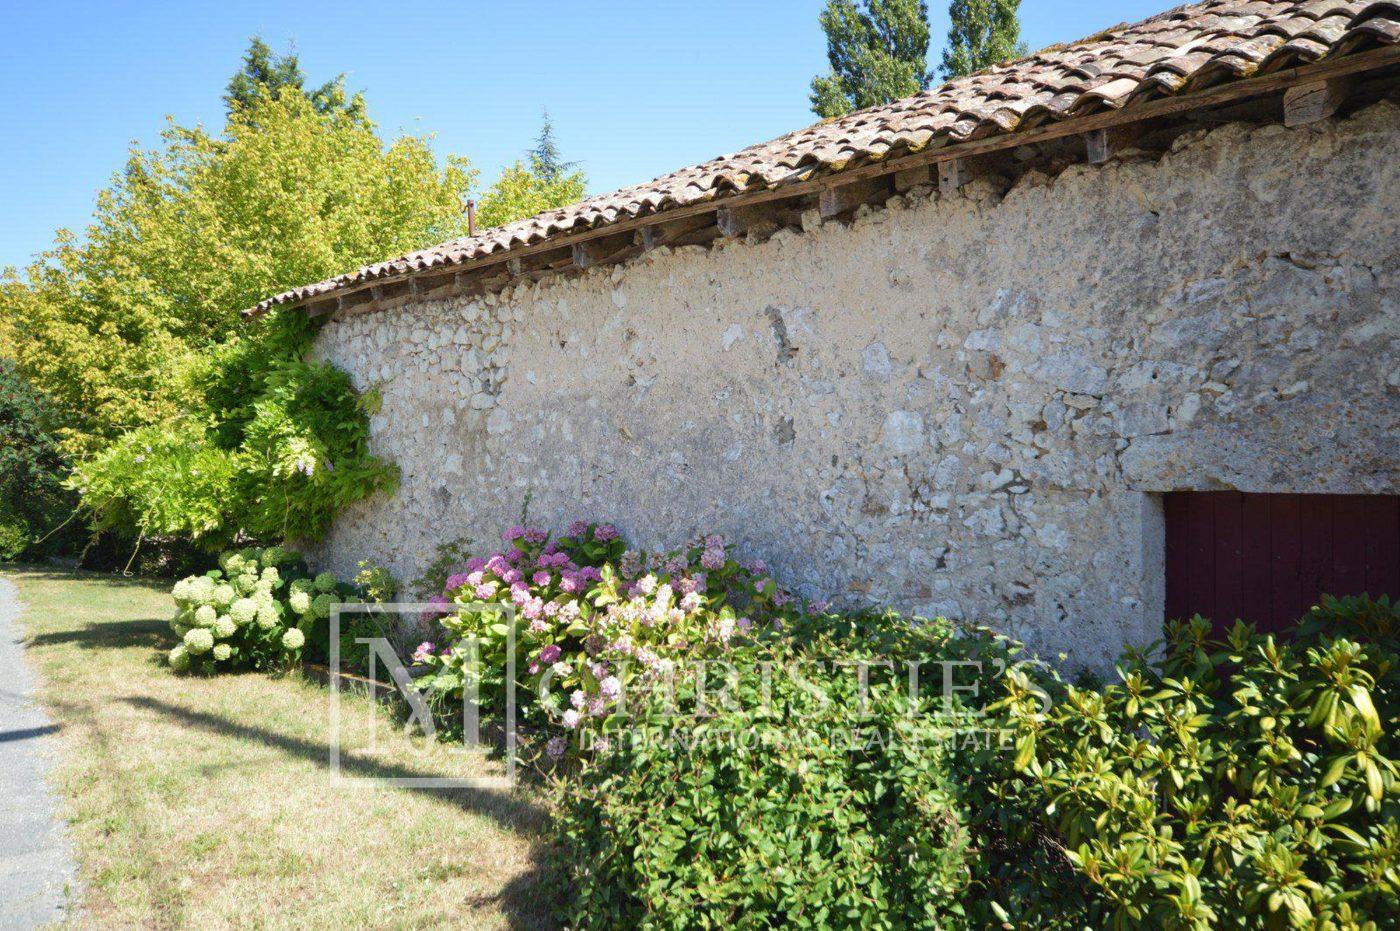 Courtyard - Idyllic awarding winning 11 hectare vineyard in one of Bergerac's premier appellations,